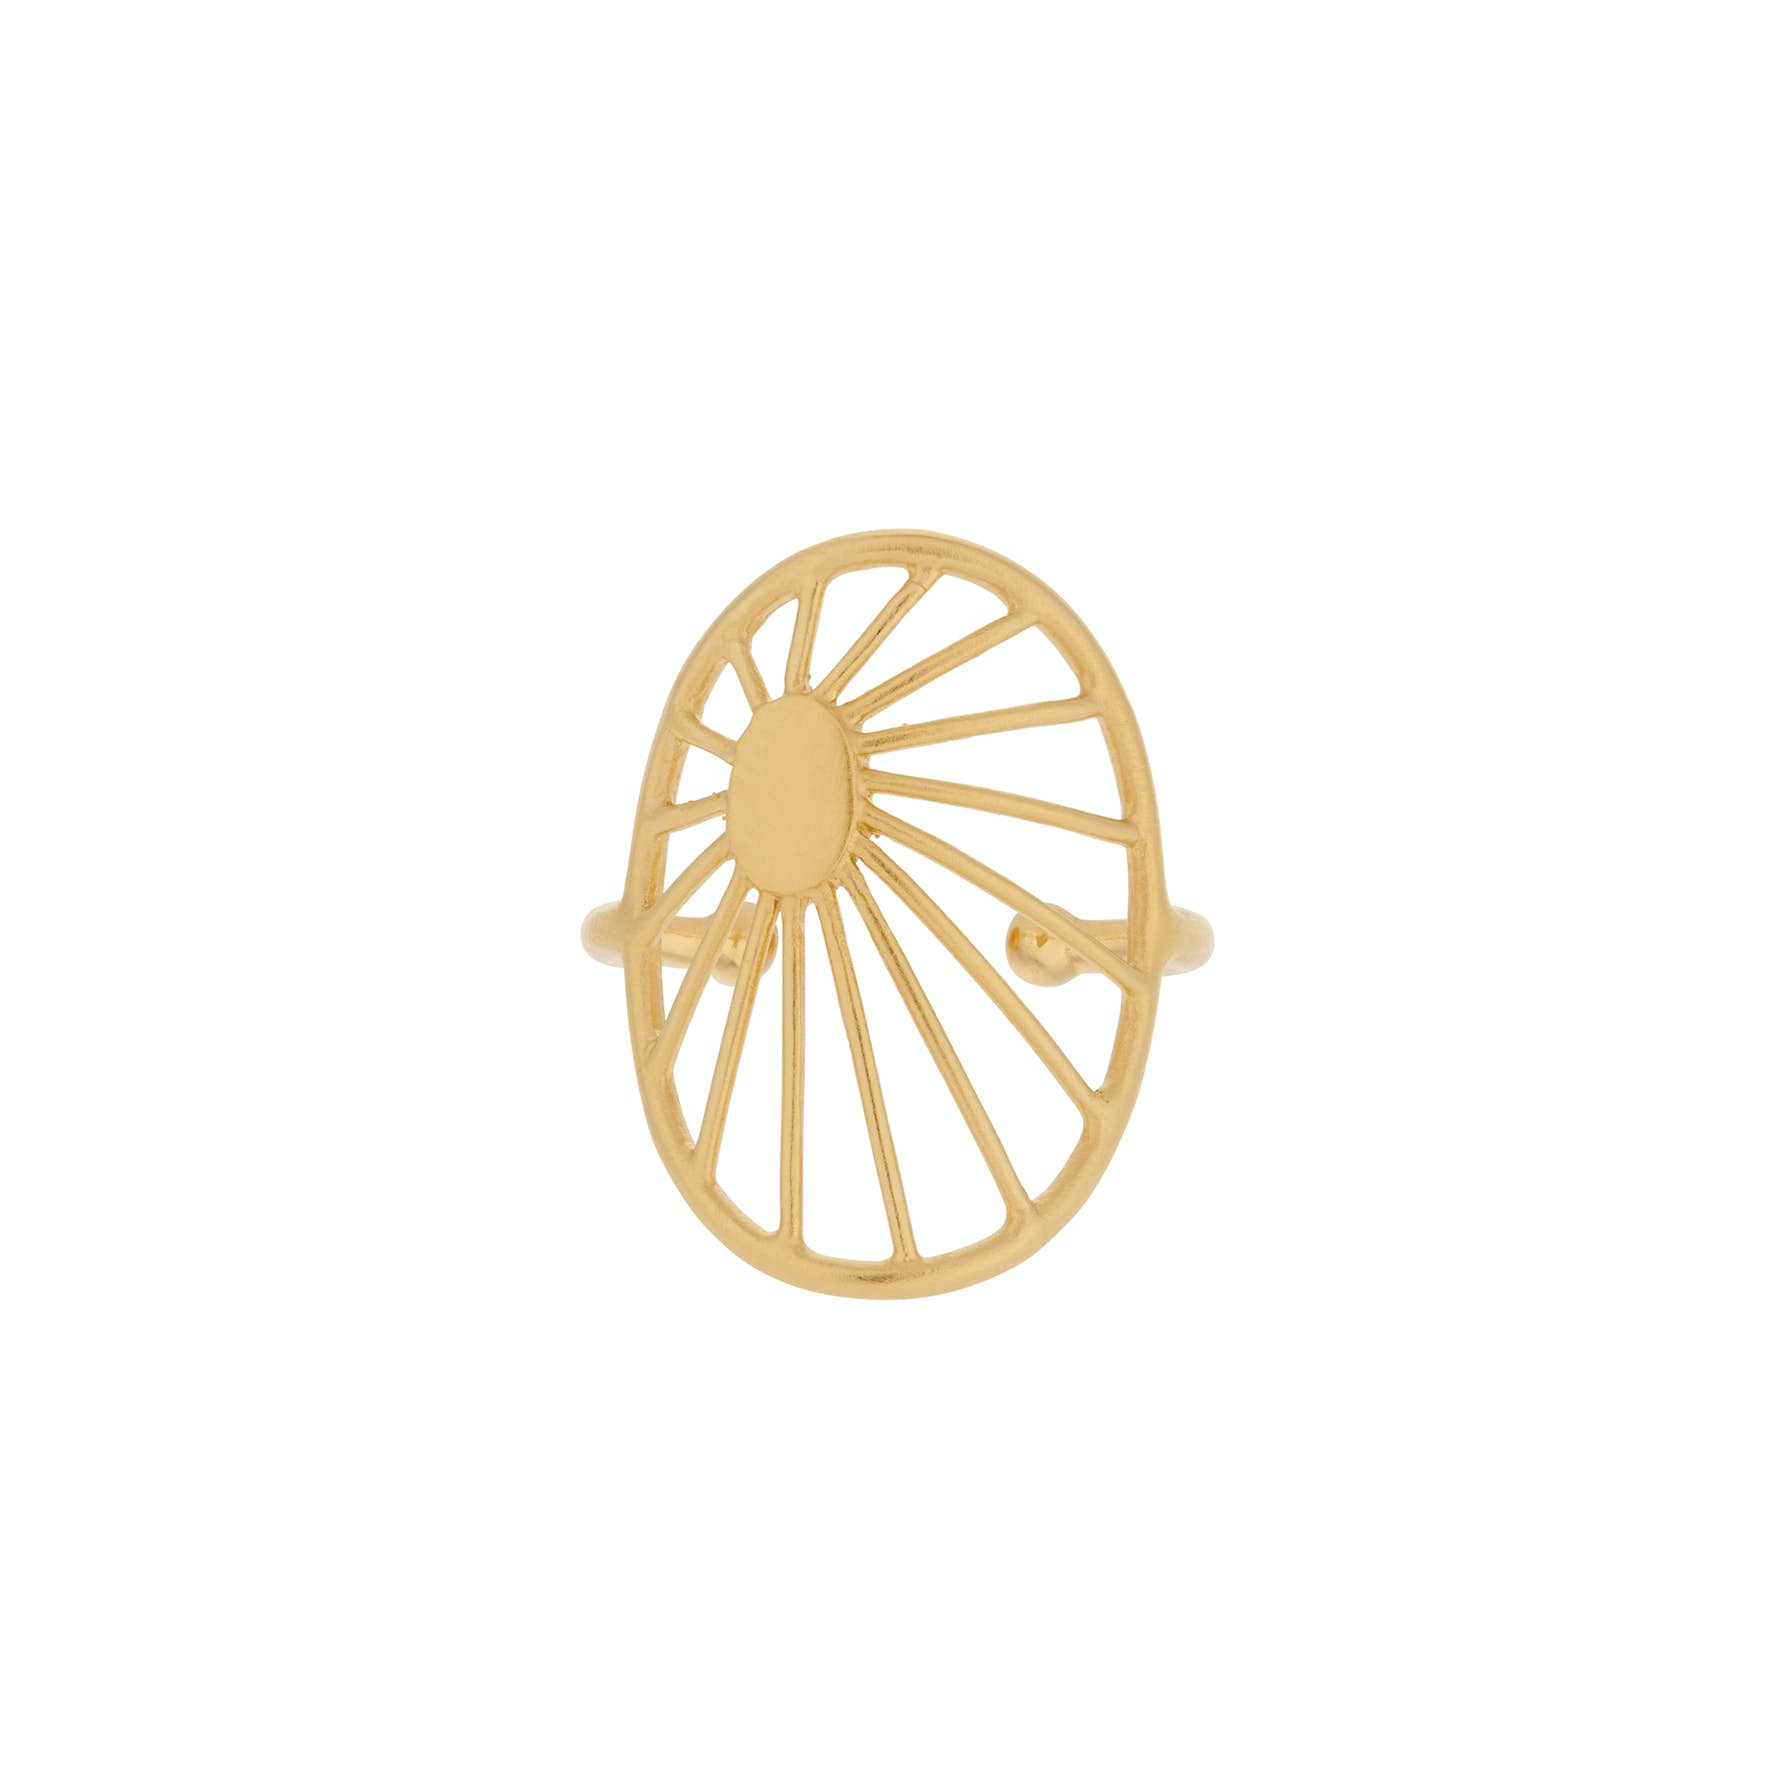 Daydream Ring von Pernille Corydon in Vergoldet-Silber Sterling 925